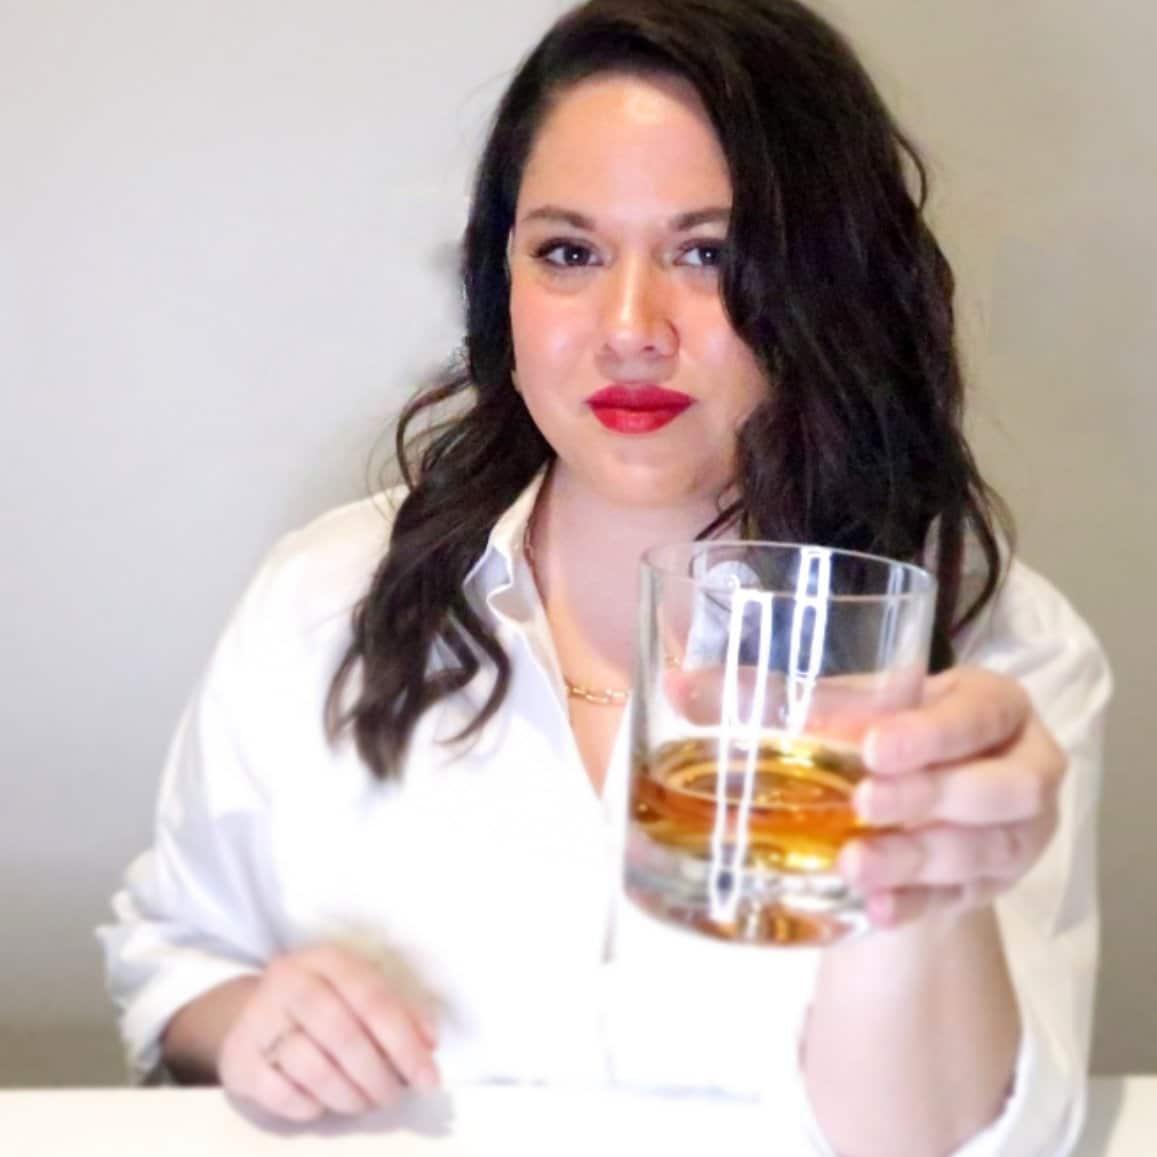 Heather holding a beer stein